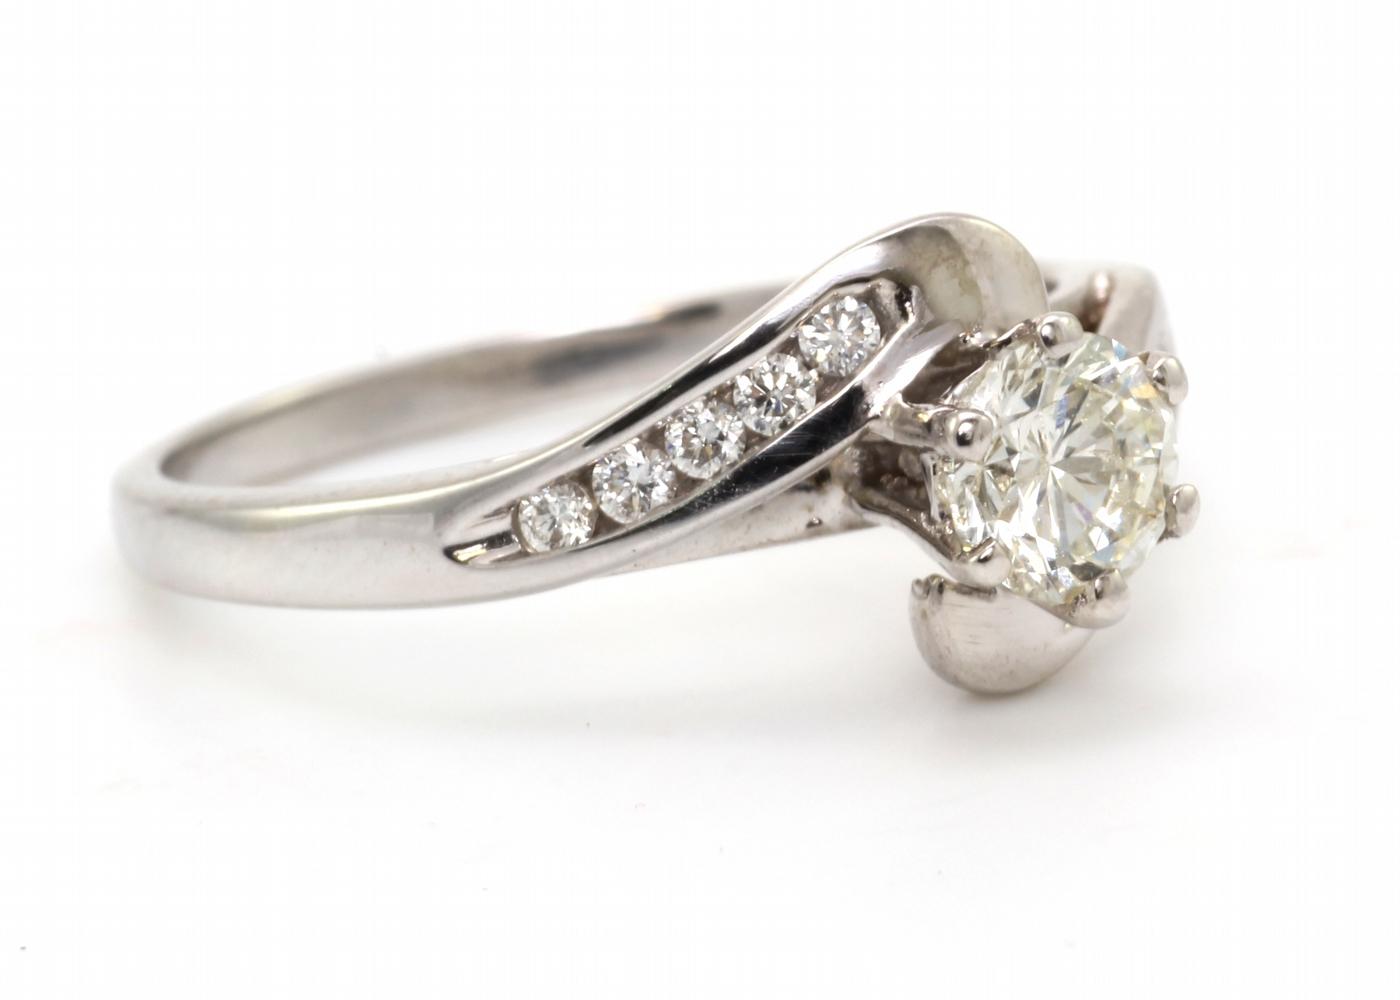 18k White Gold Single Stone Diamond Ring 0.65 Carats - Image 4 of 4